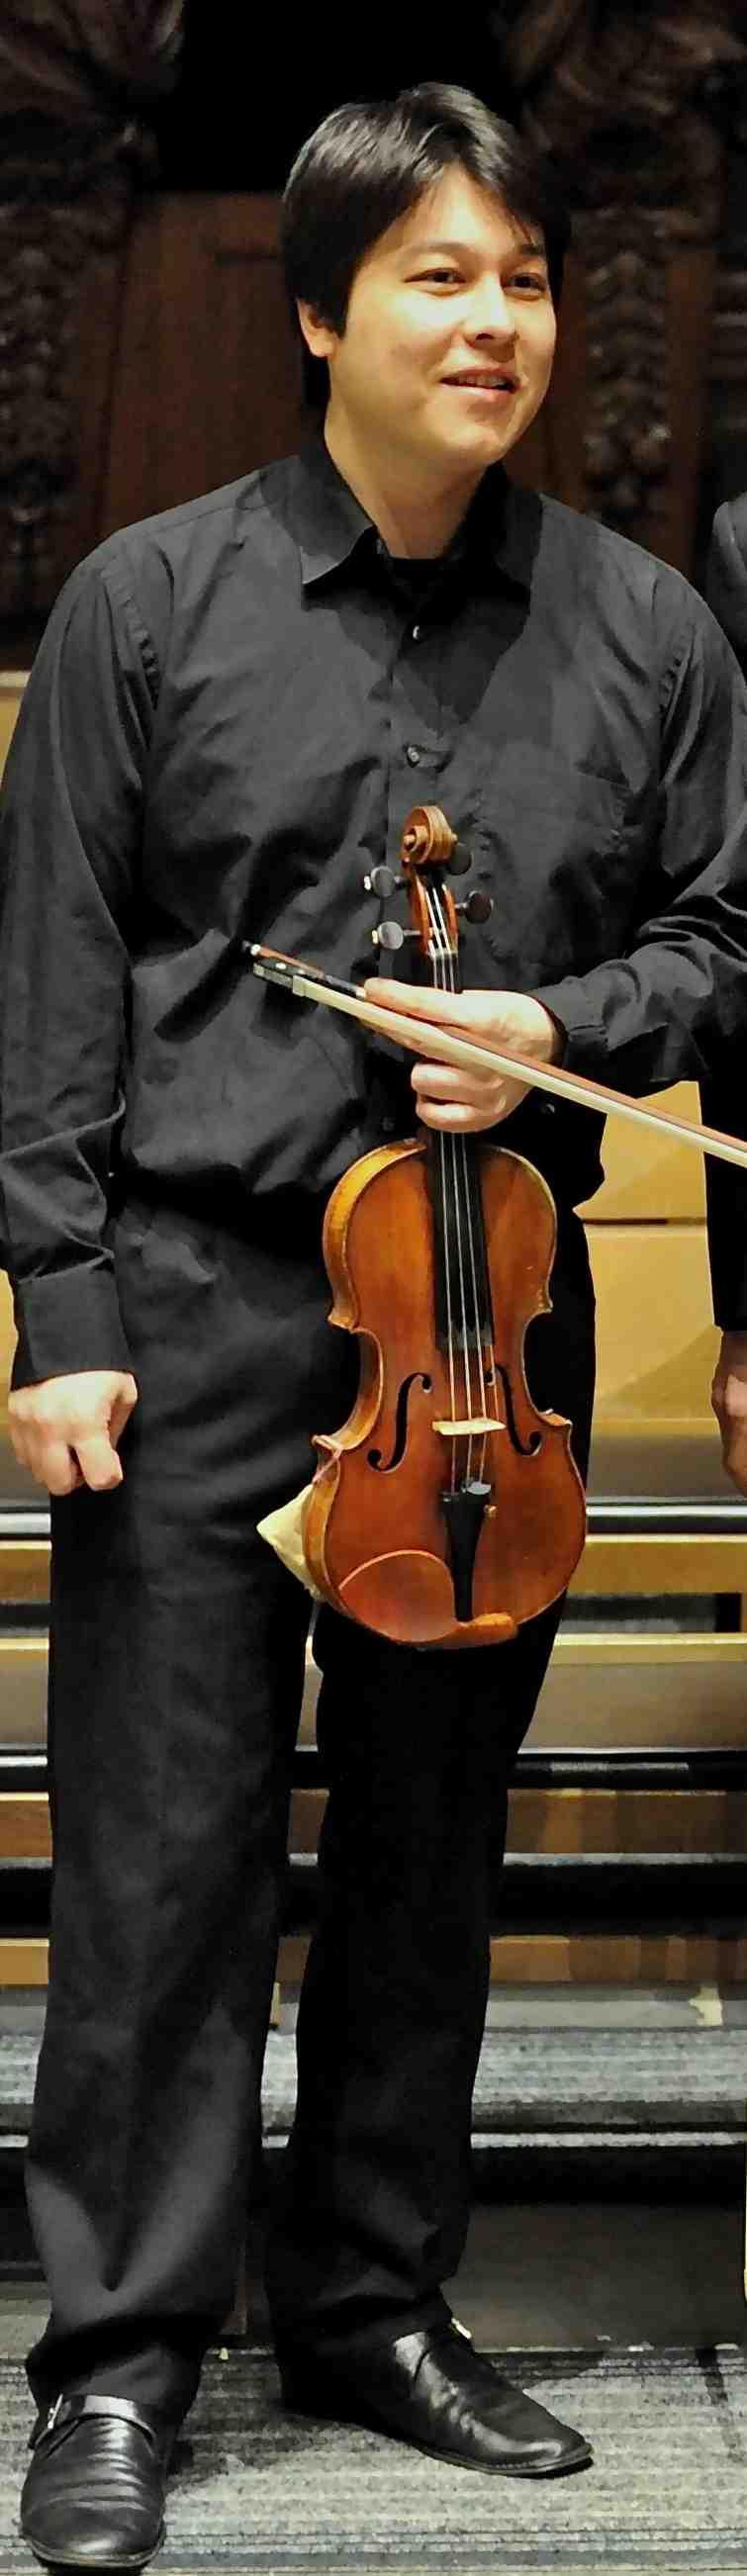 Mark Derudder: Violin